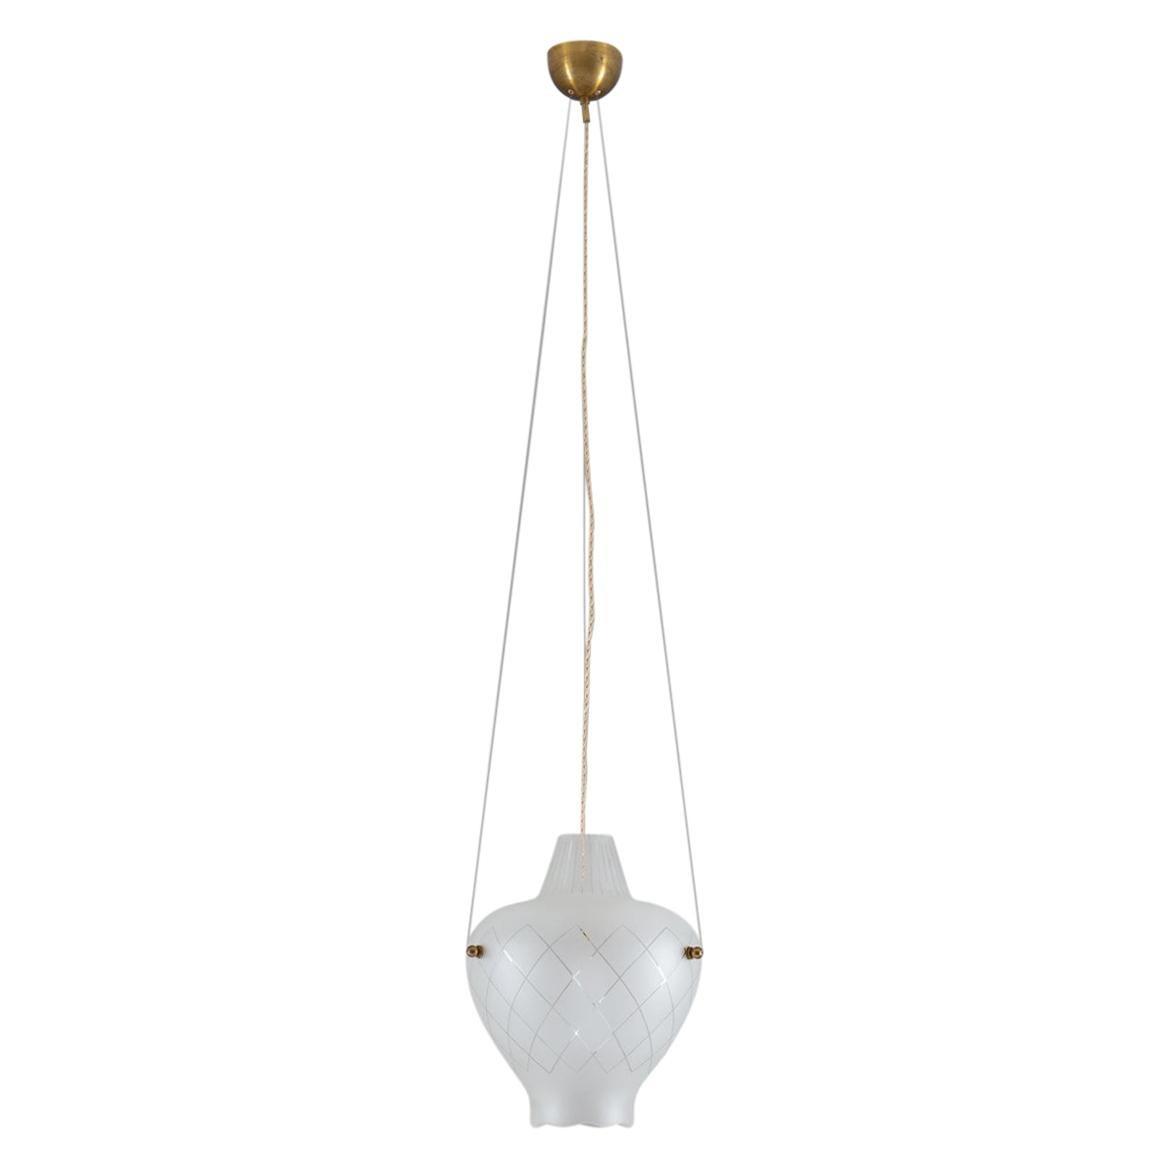 Scandinavian Pendant in Brass and Glass, Swedish Modern, 1940s